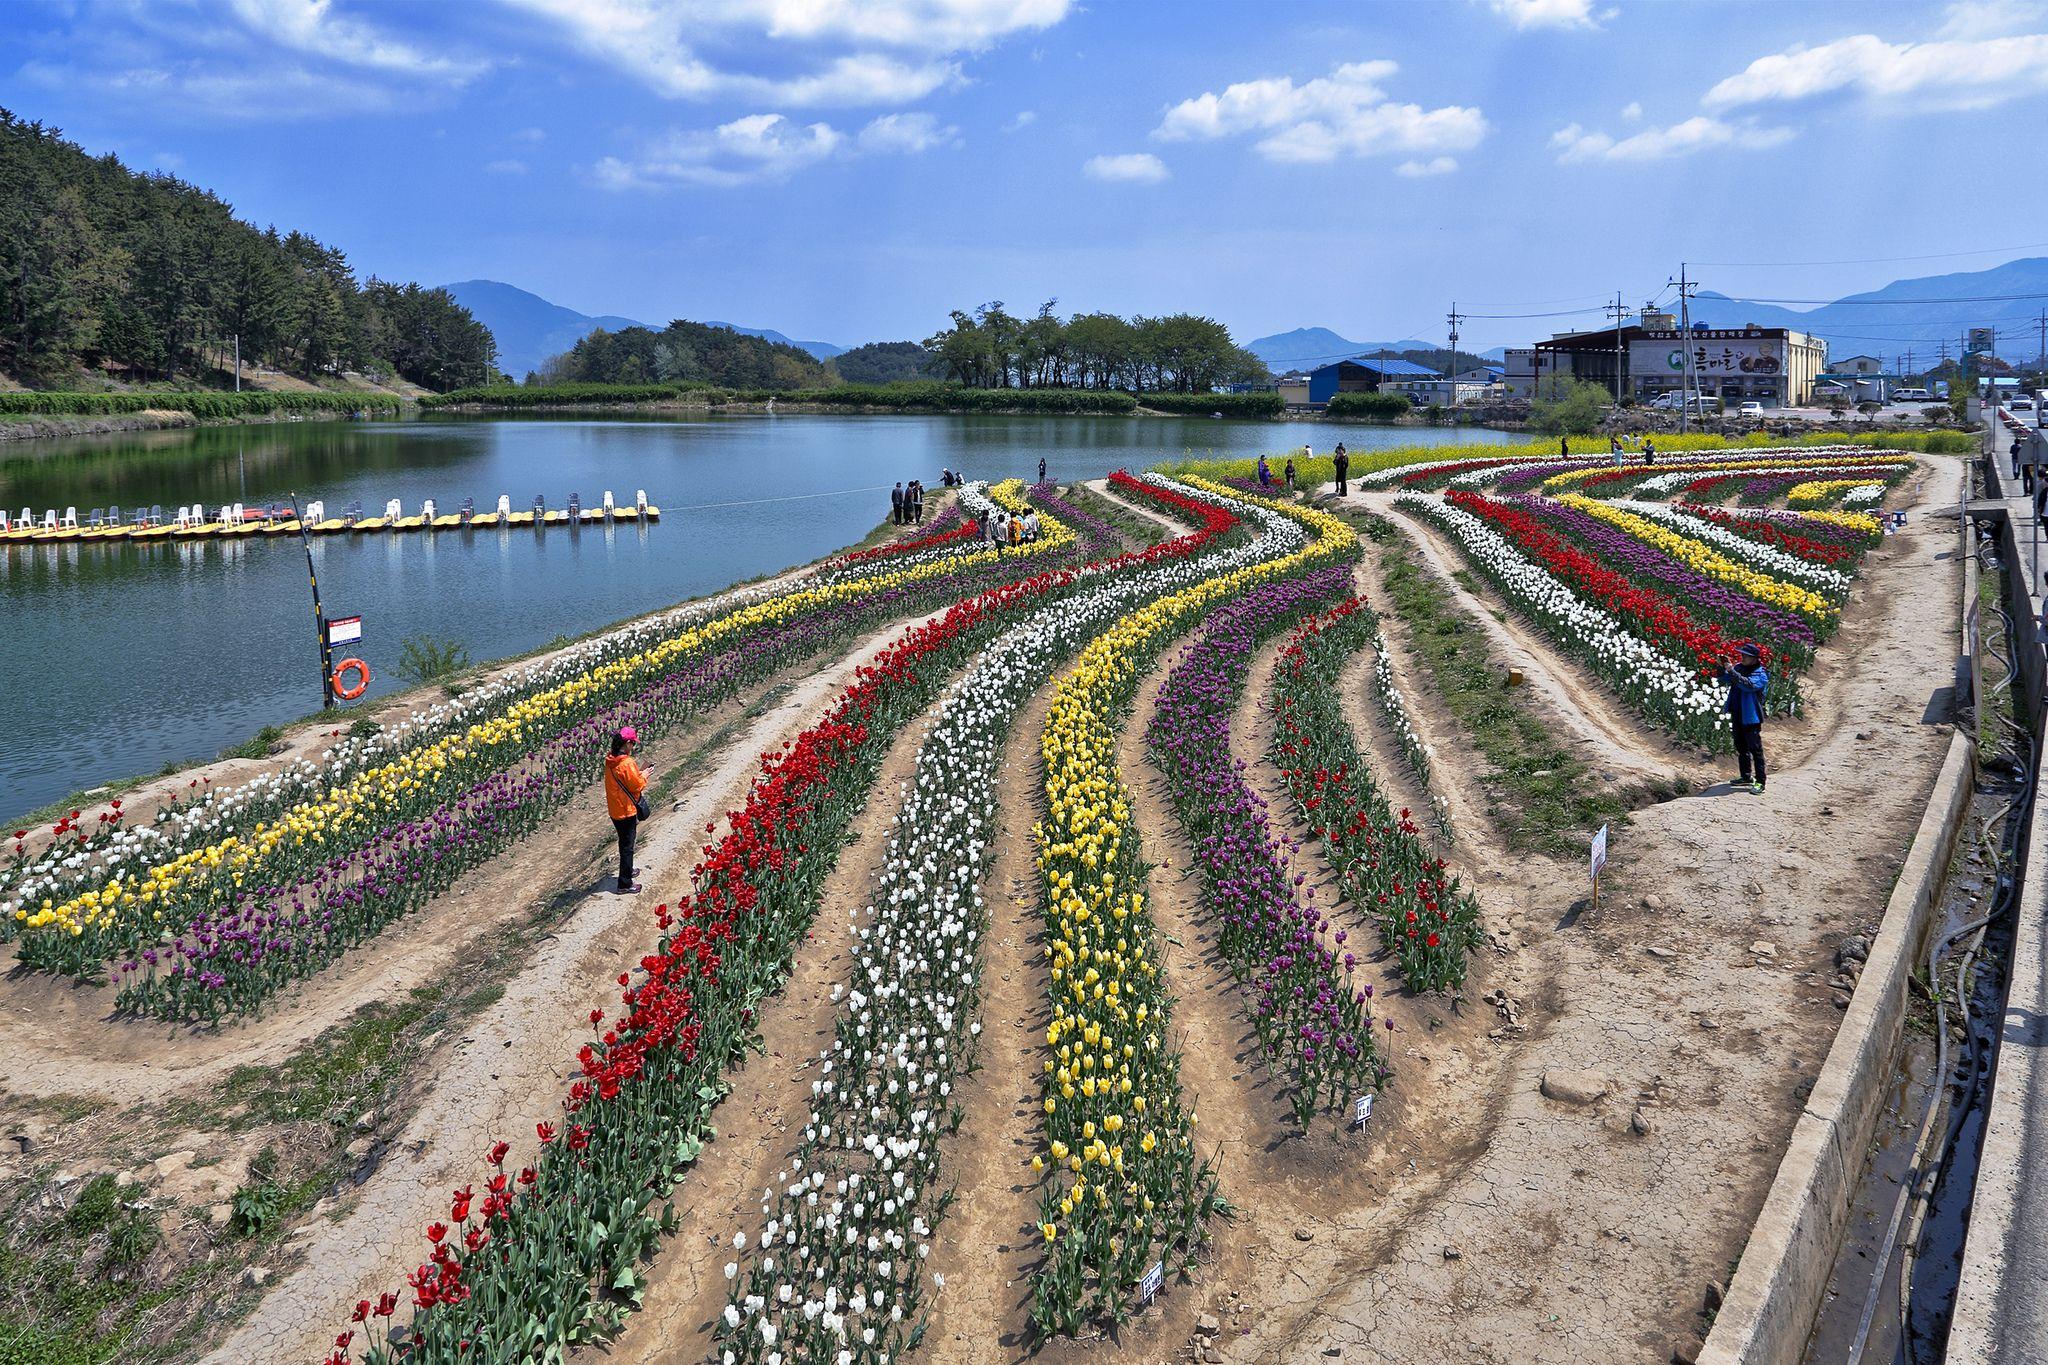 https://flic.kr/p/ecJ8W3 | kIMG_0537 | Tulip Festival ,South Korea (남해 장평저수지)